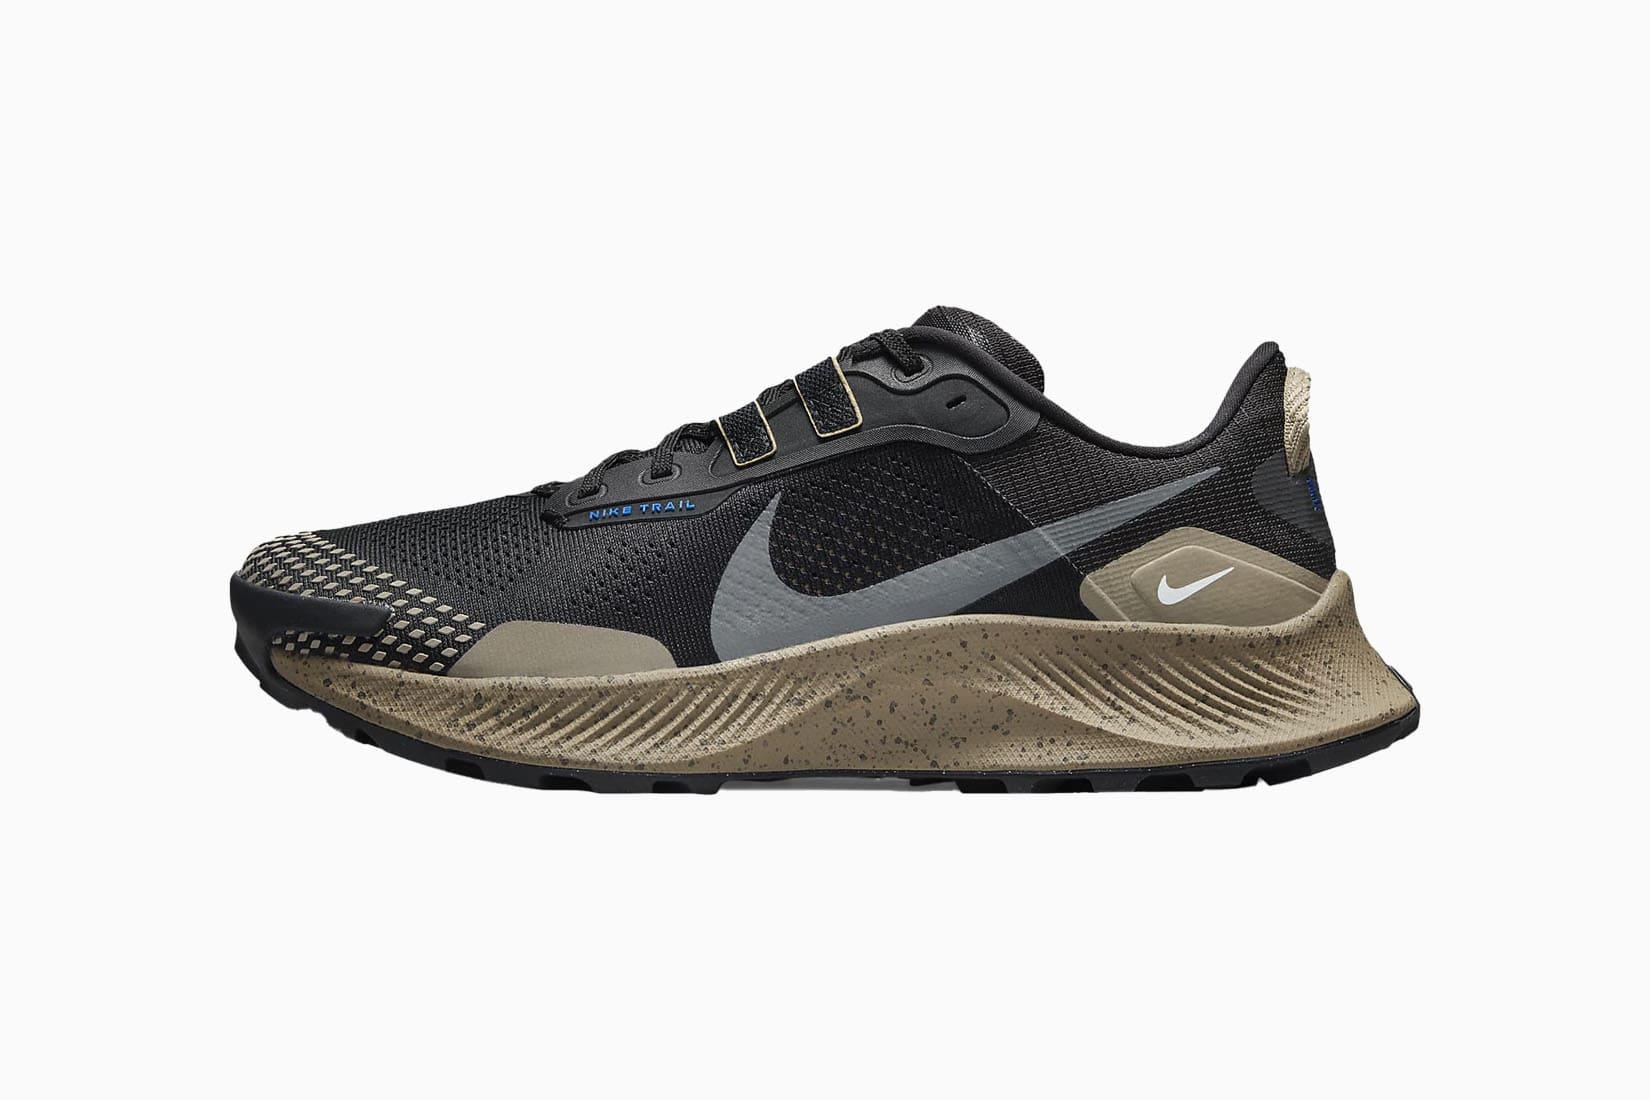 best waterproof shoes men nike review Luxe Digital